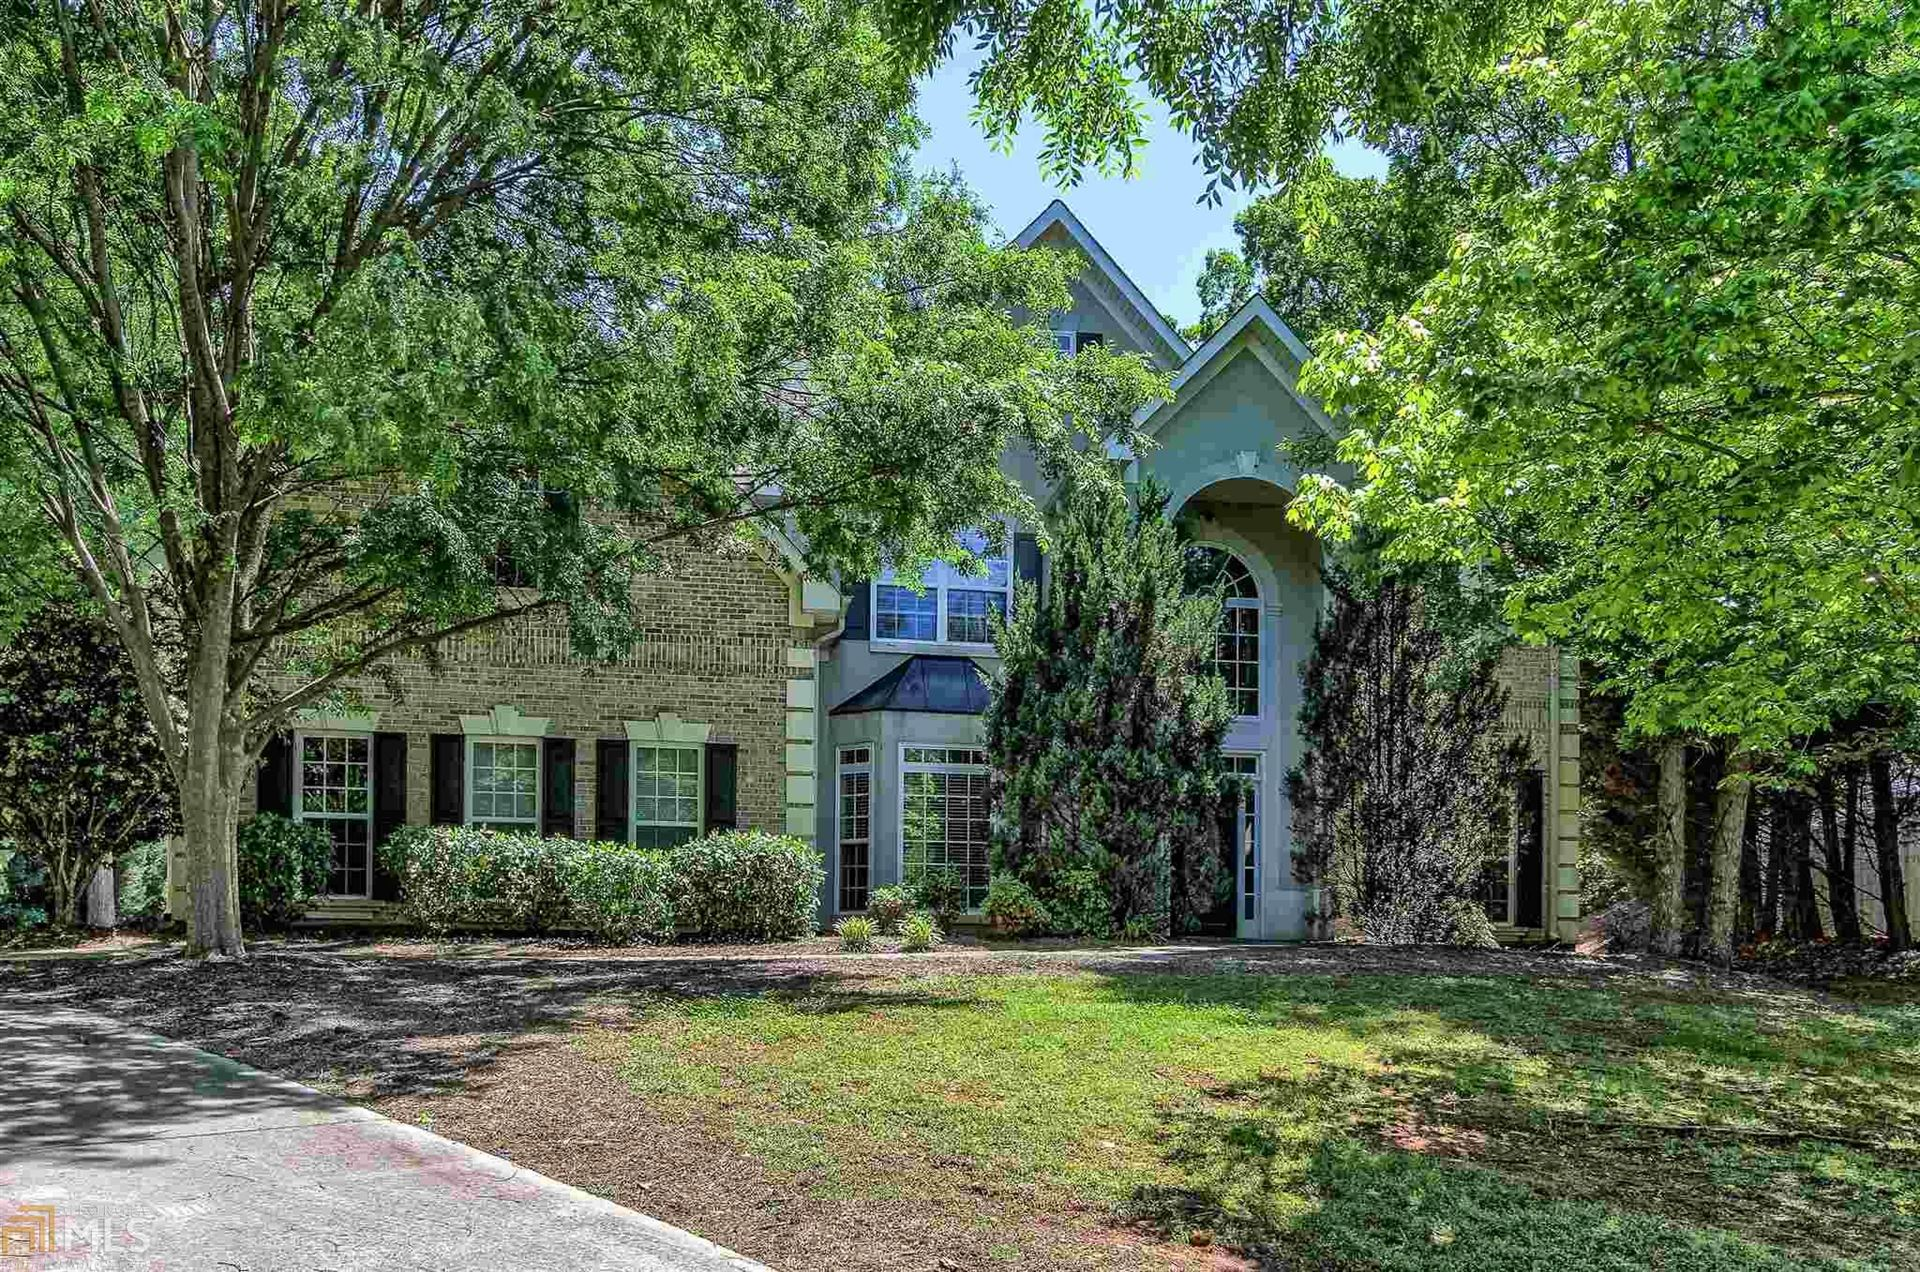 348 Broadmoor Way, McDonough, GA 30253 - MLS#: 8795067